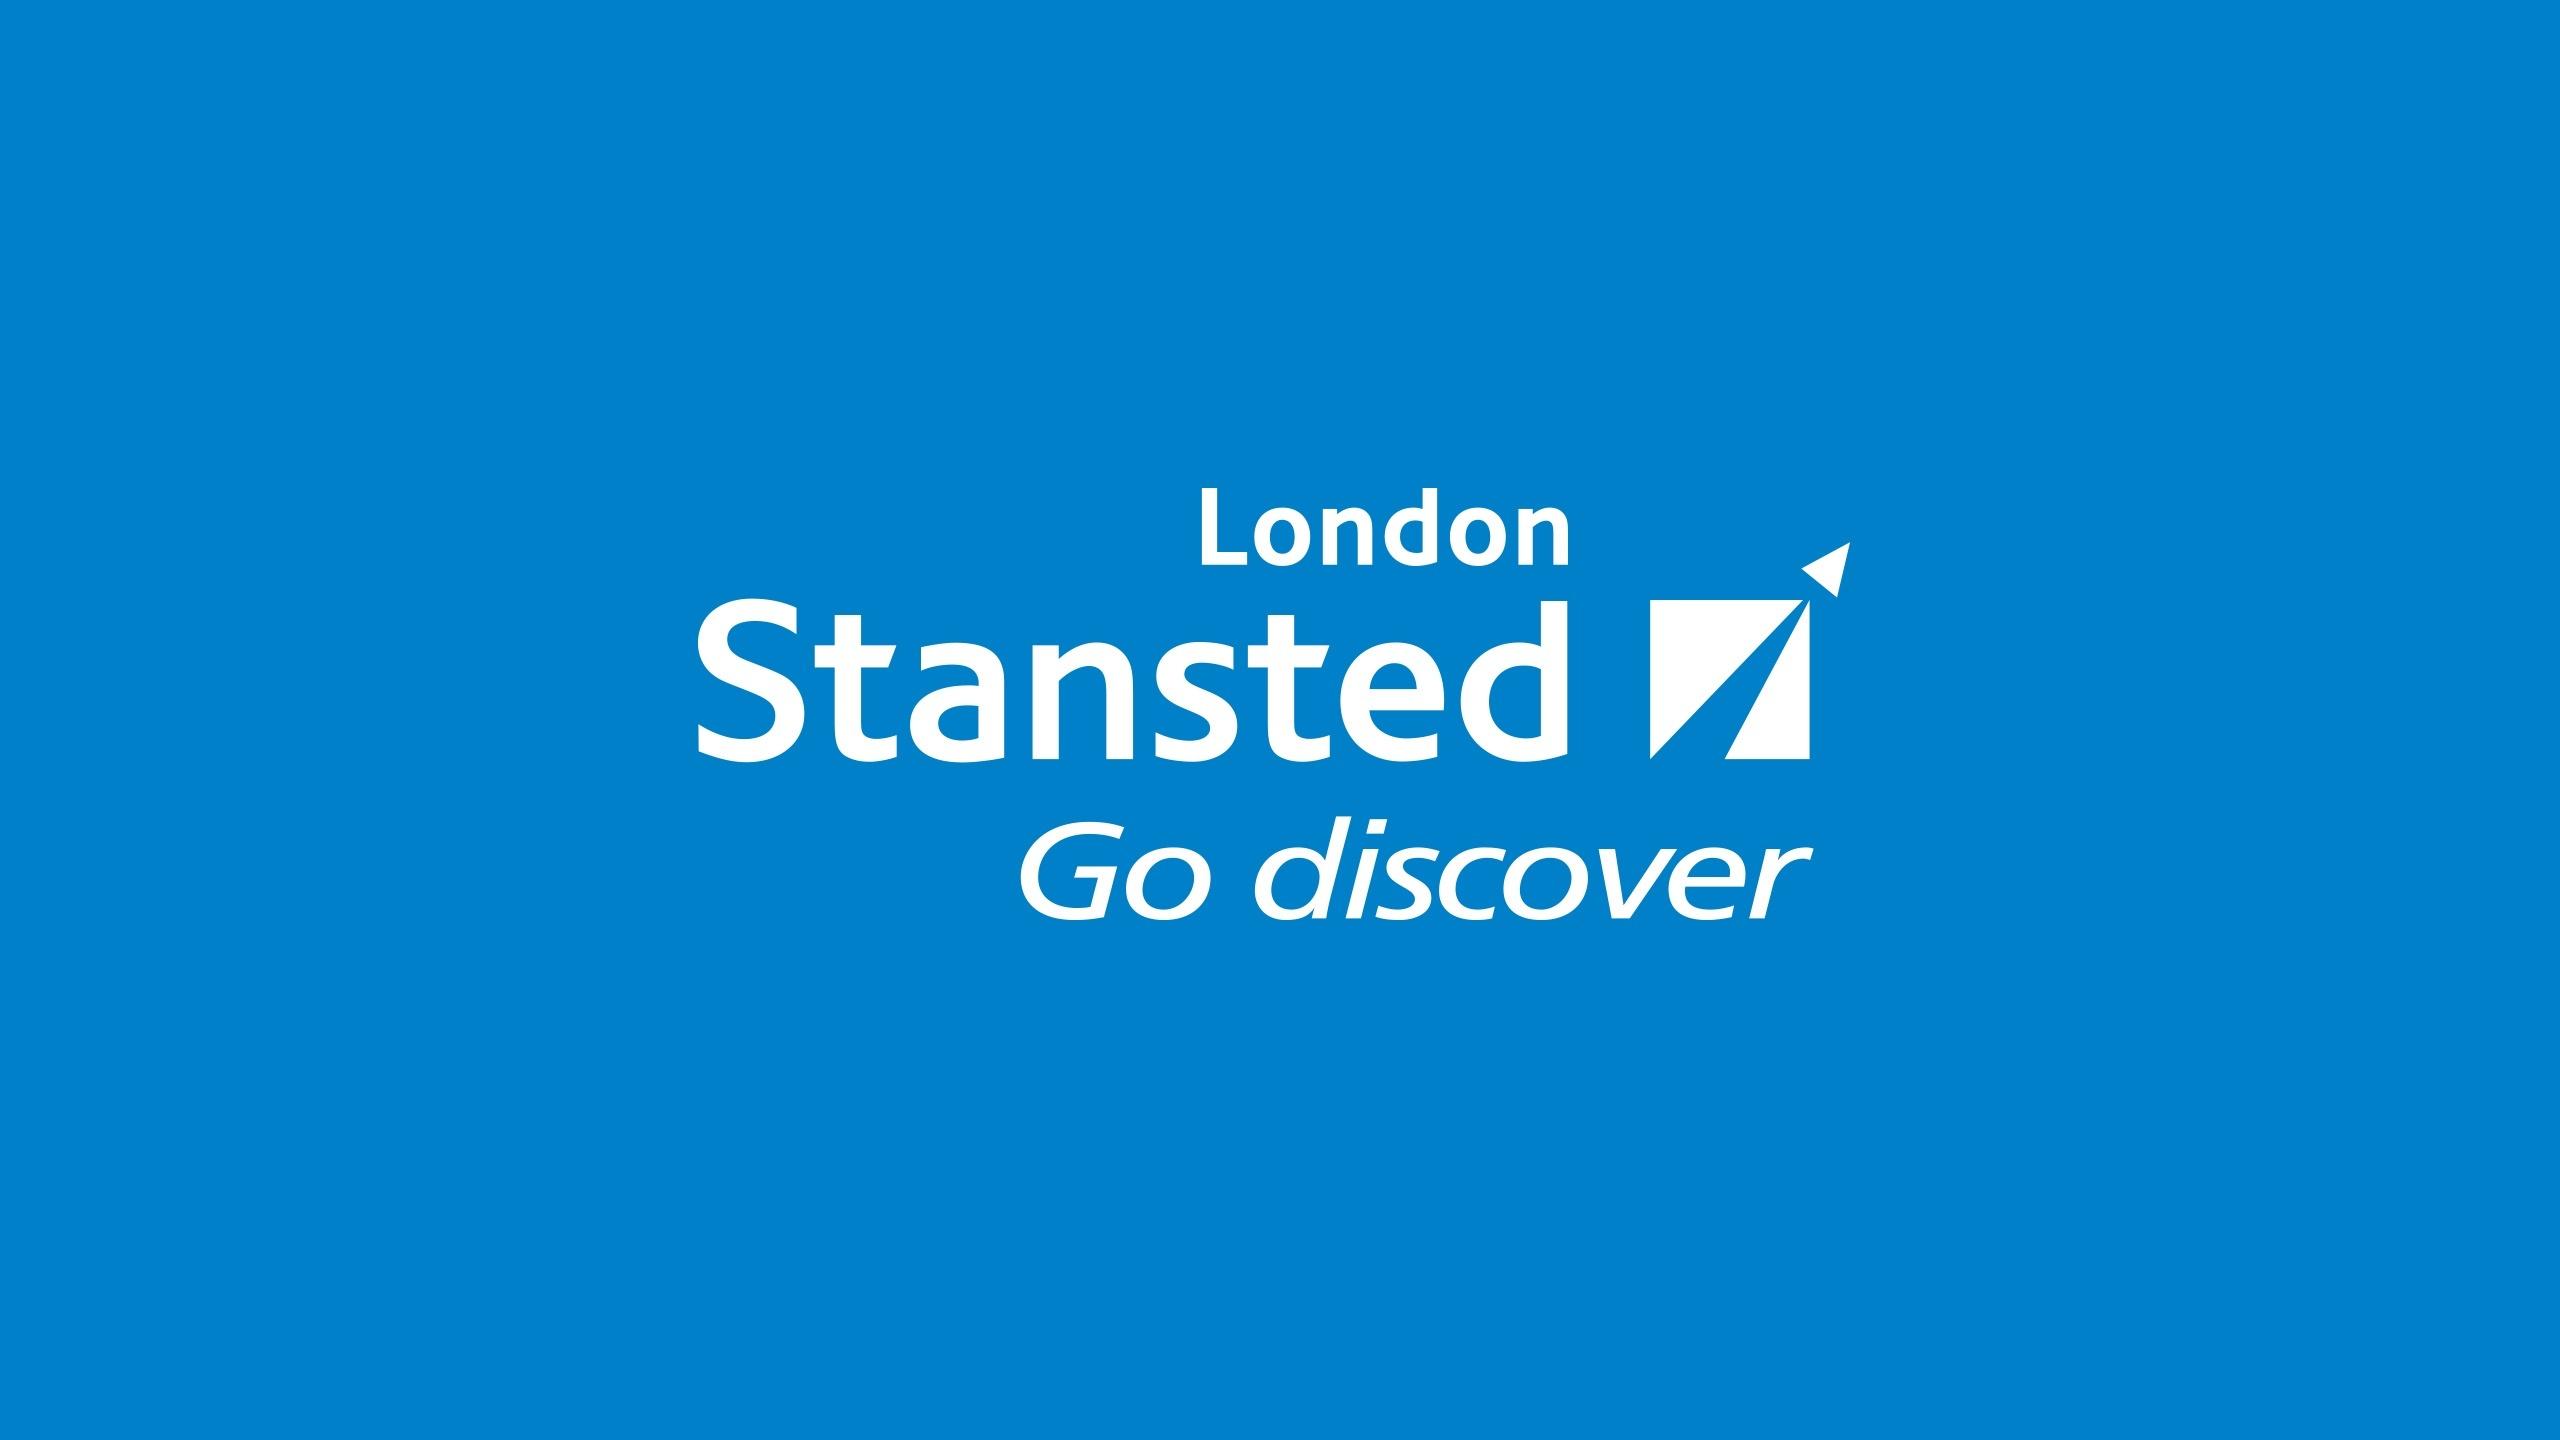 London Stansted branding